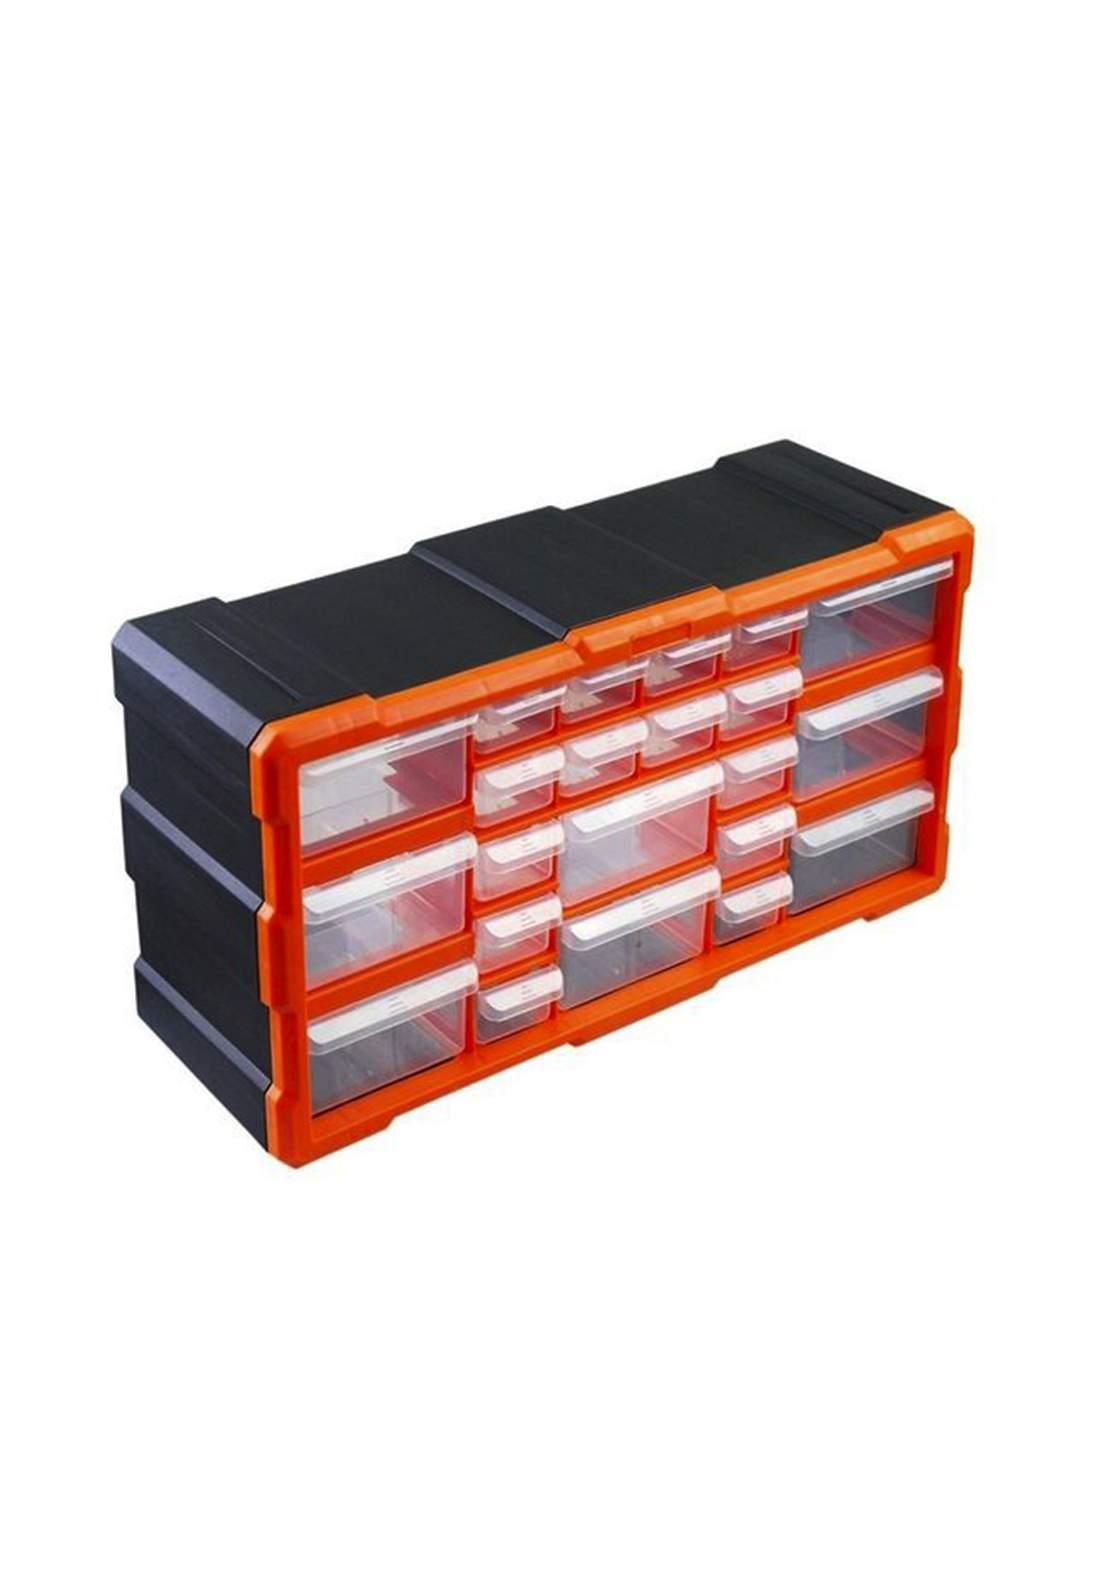 Tool Storage Box - Black صندوق تخزين  أدوات